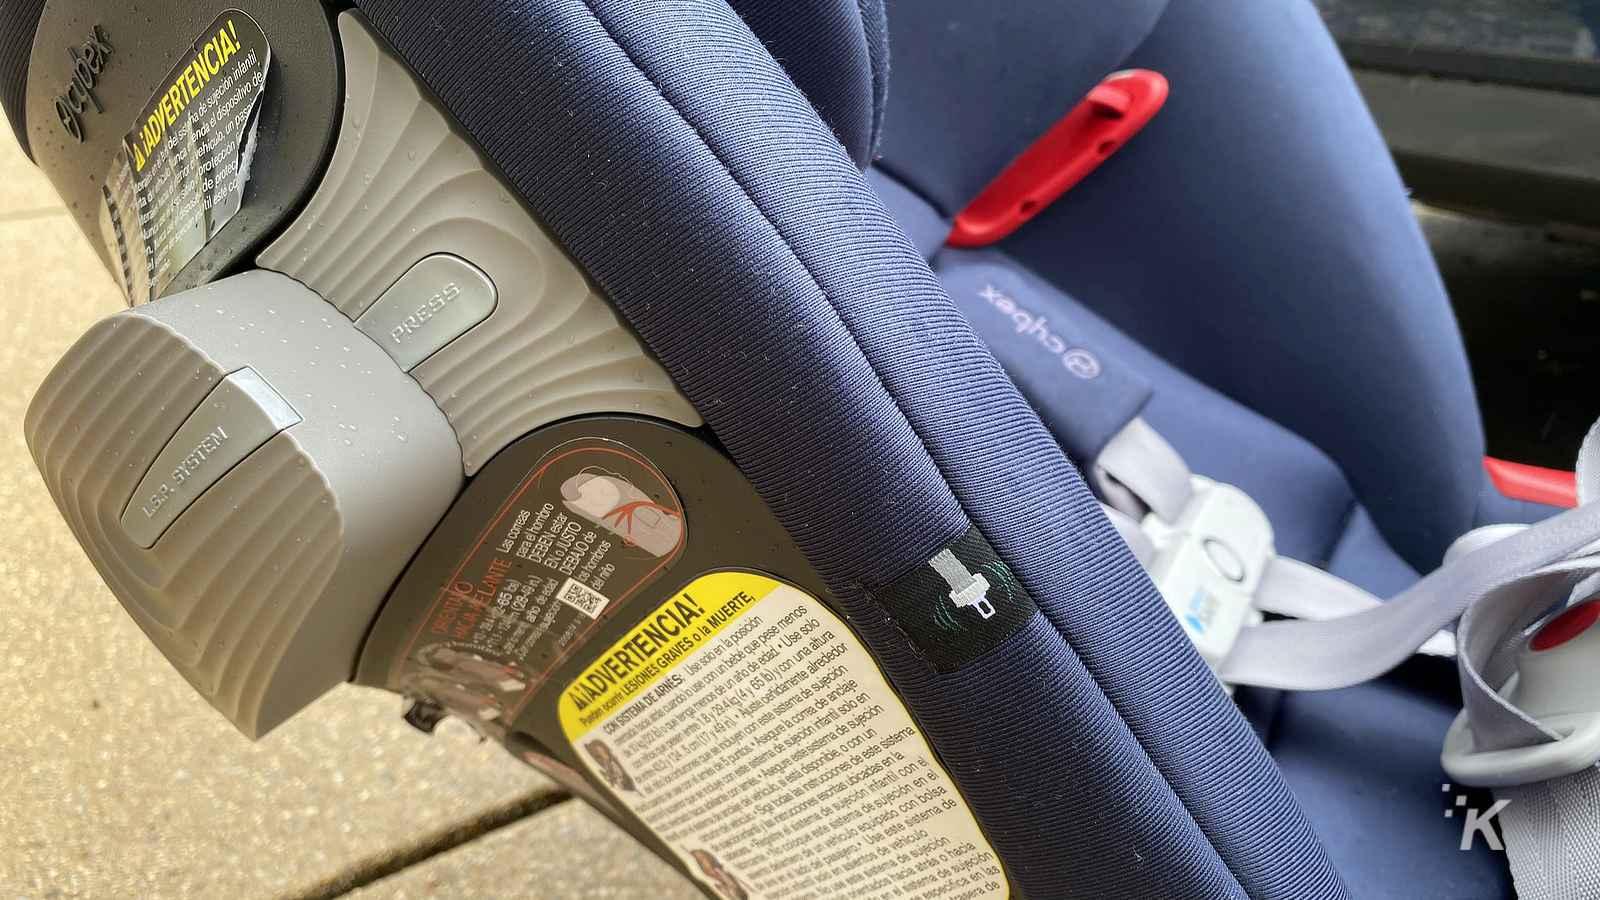 cybex priam smart car seat